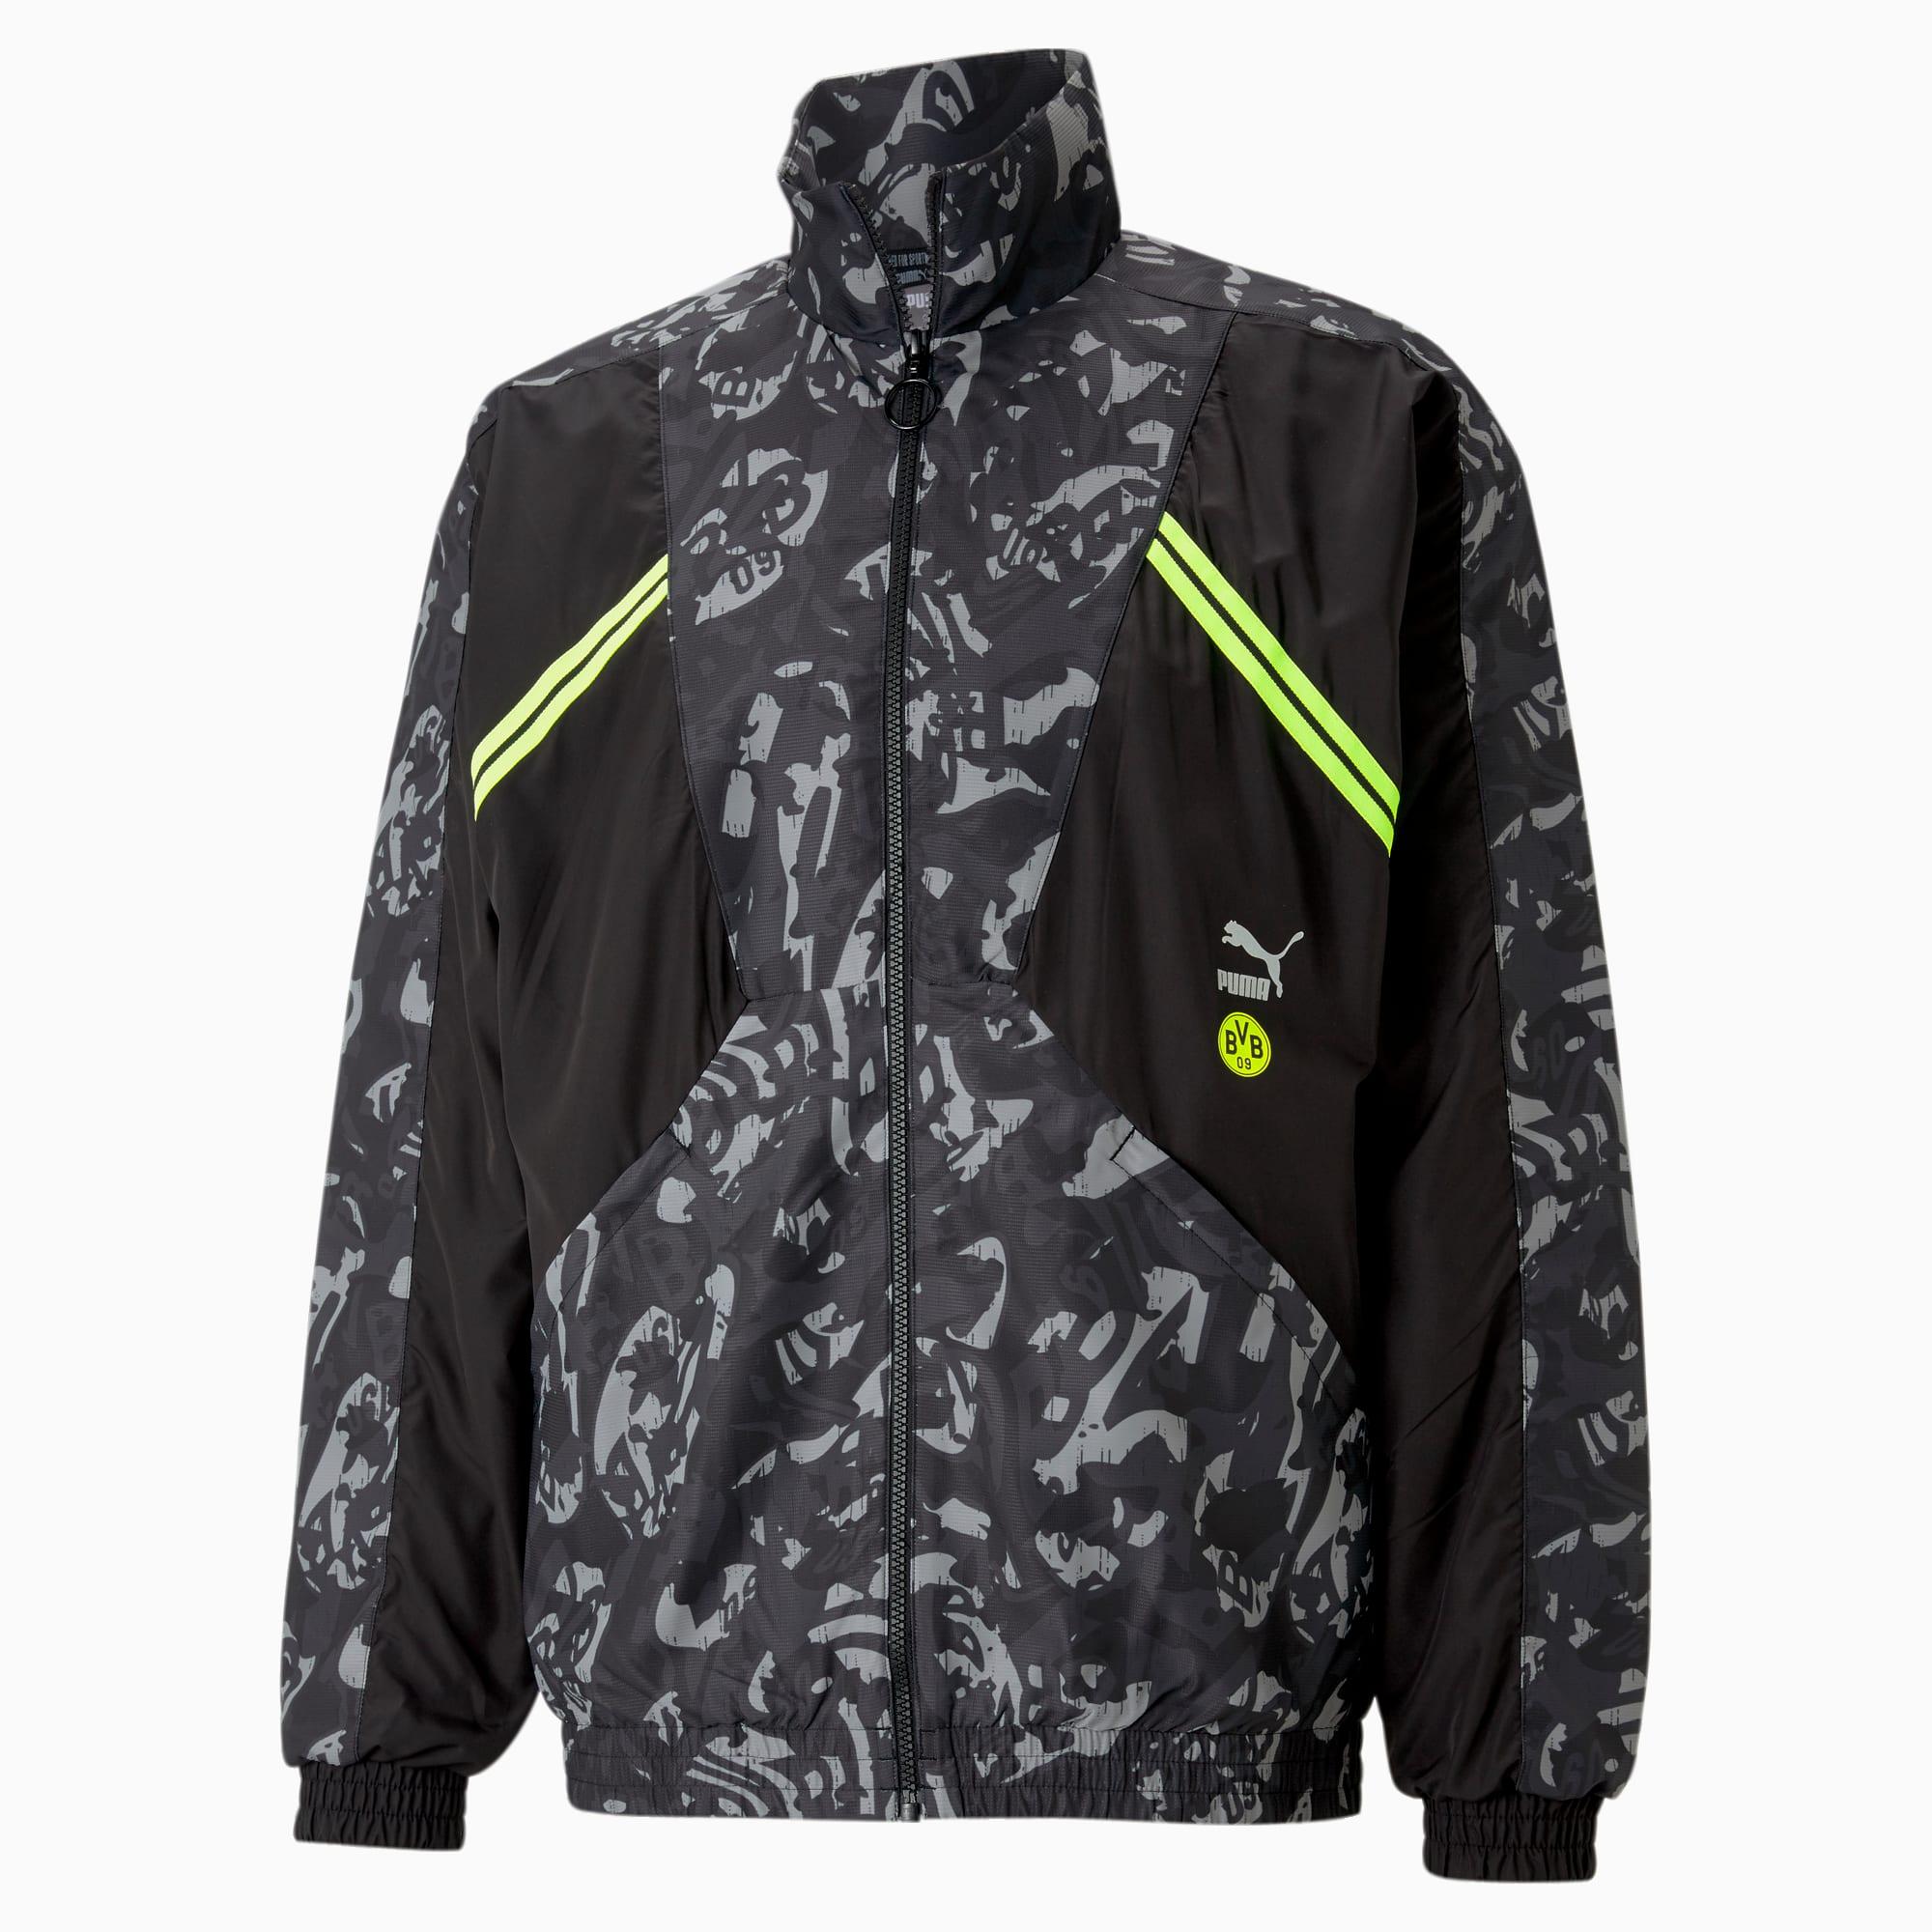 BVB TFS Woven Men's Football Jacket